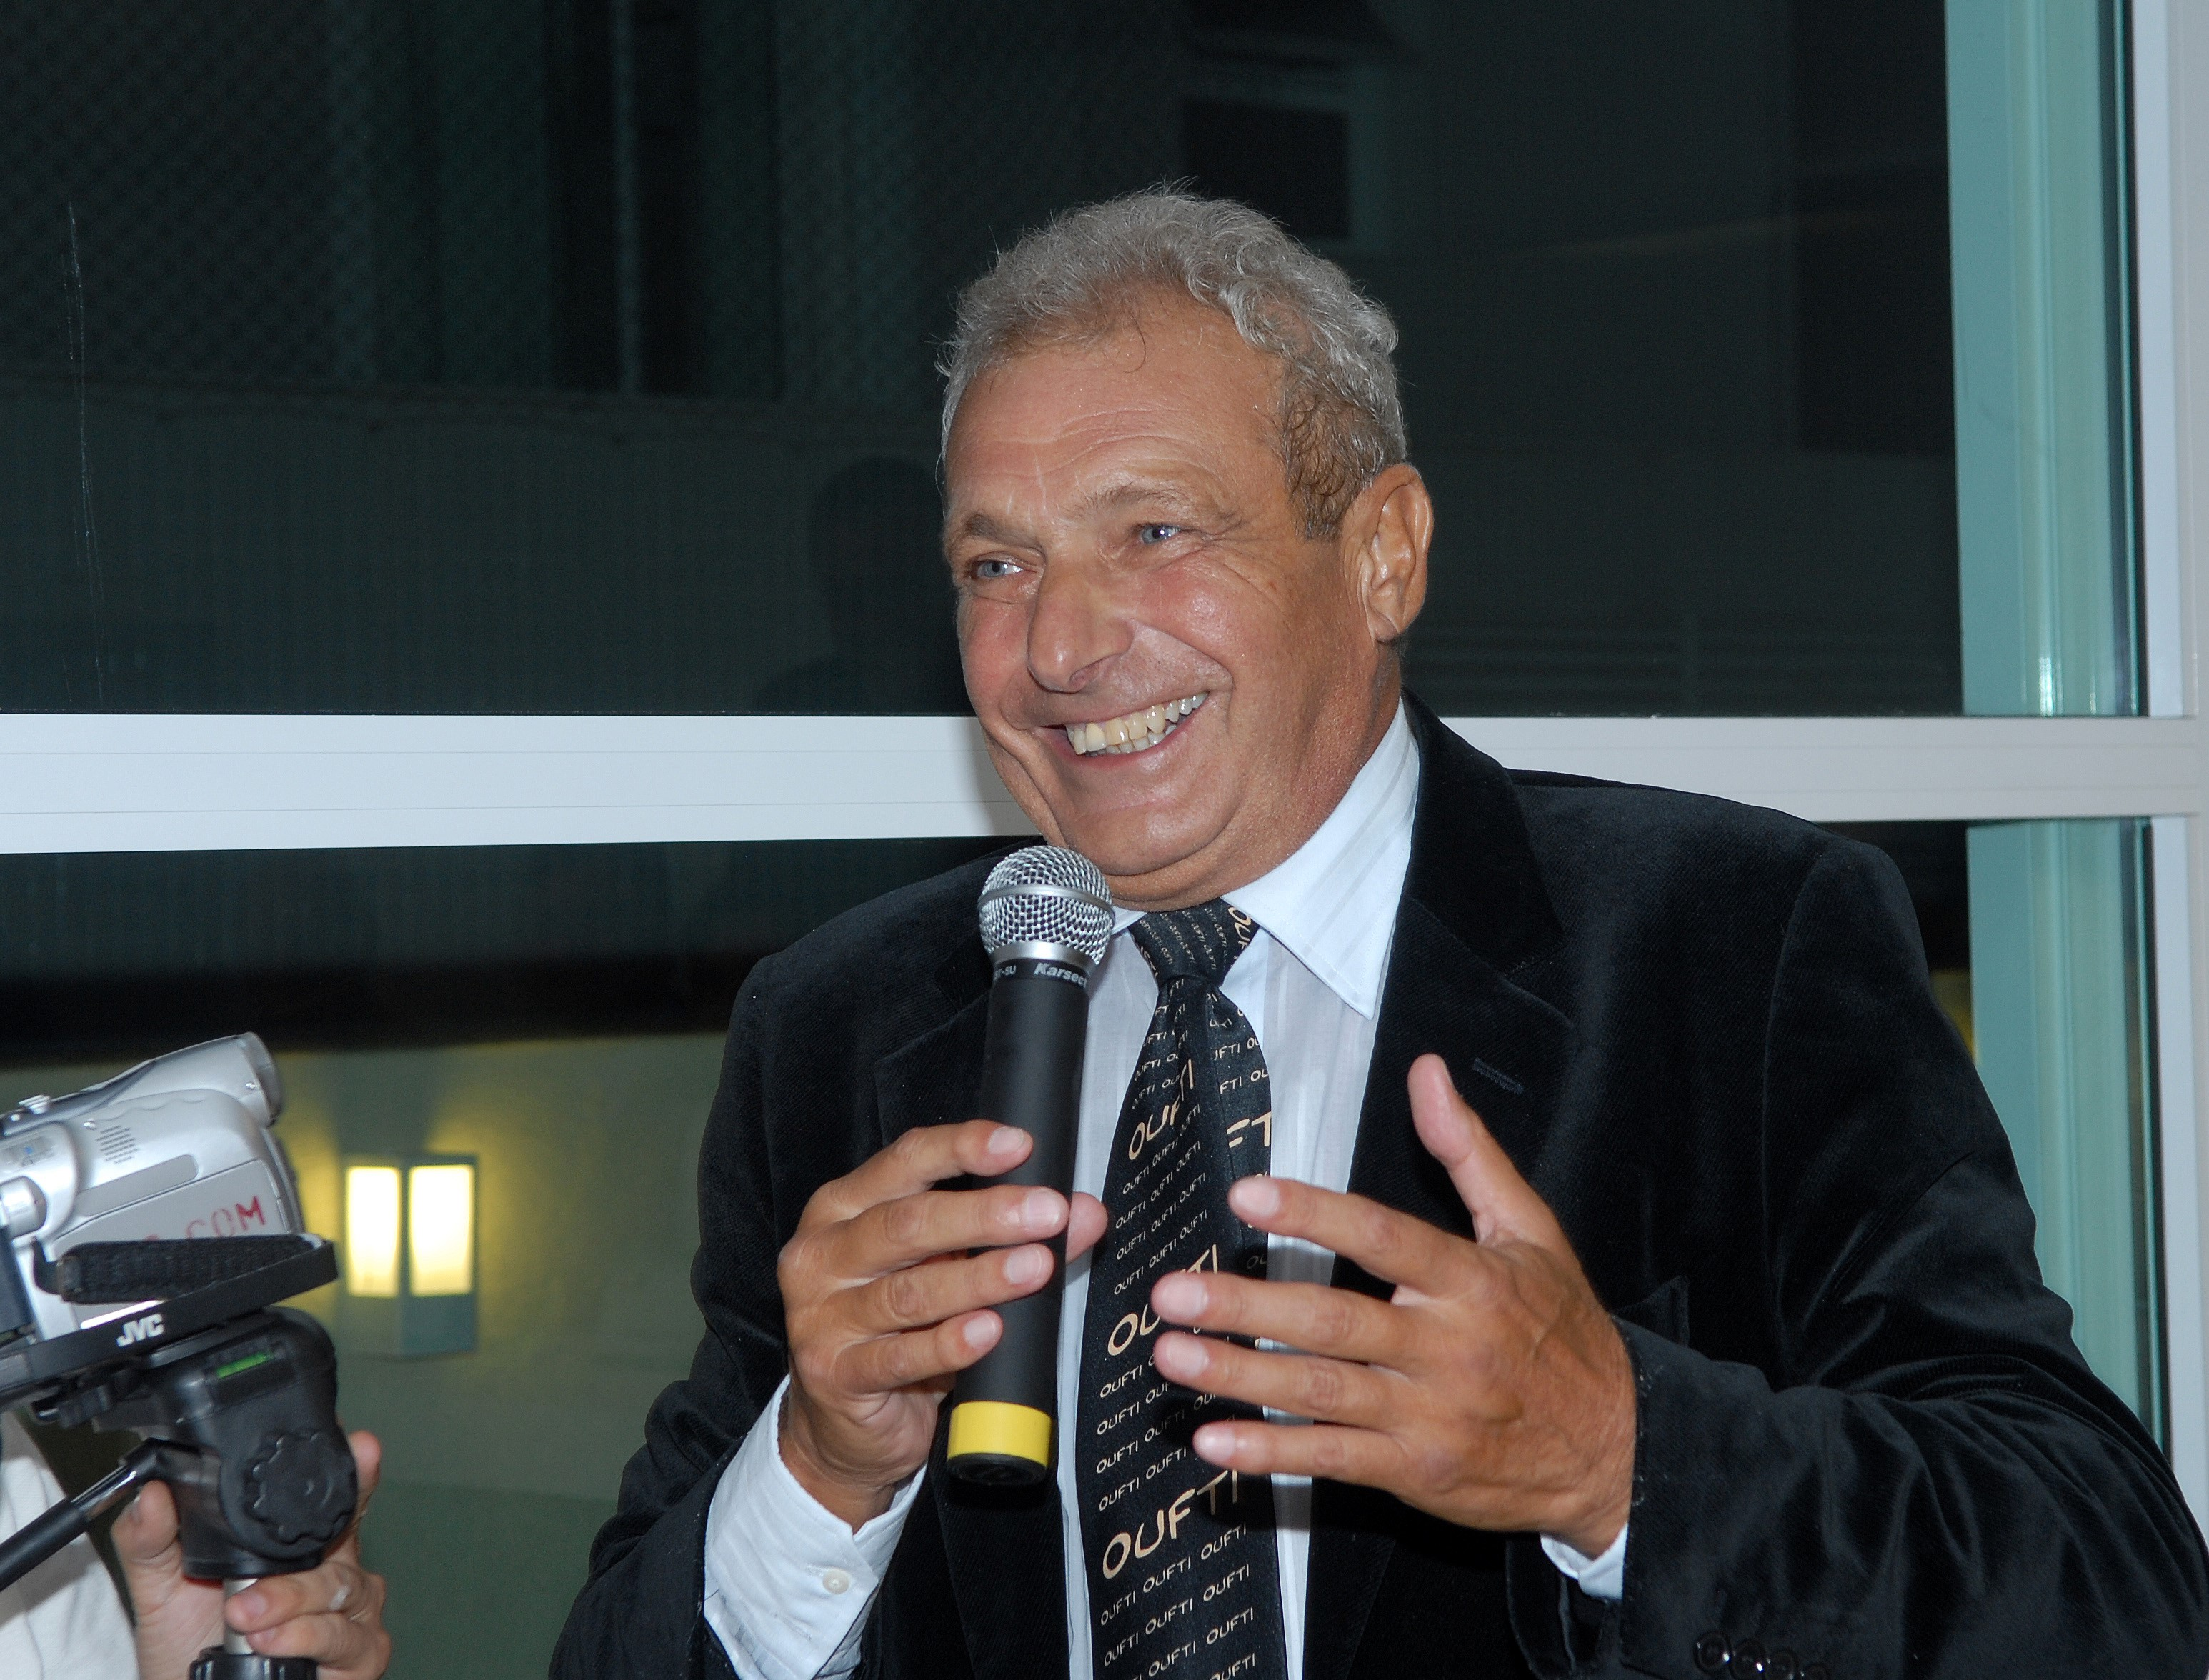 Philippe Emmanuel Souchard